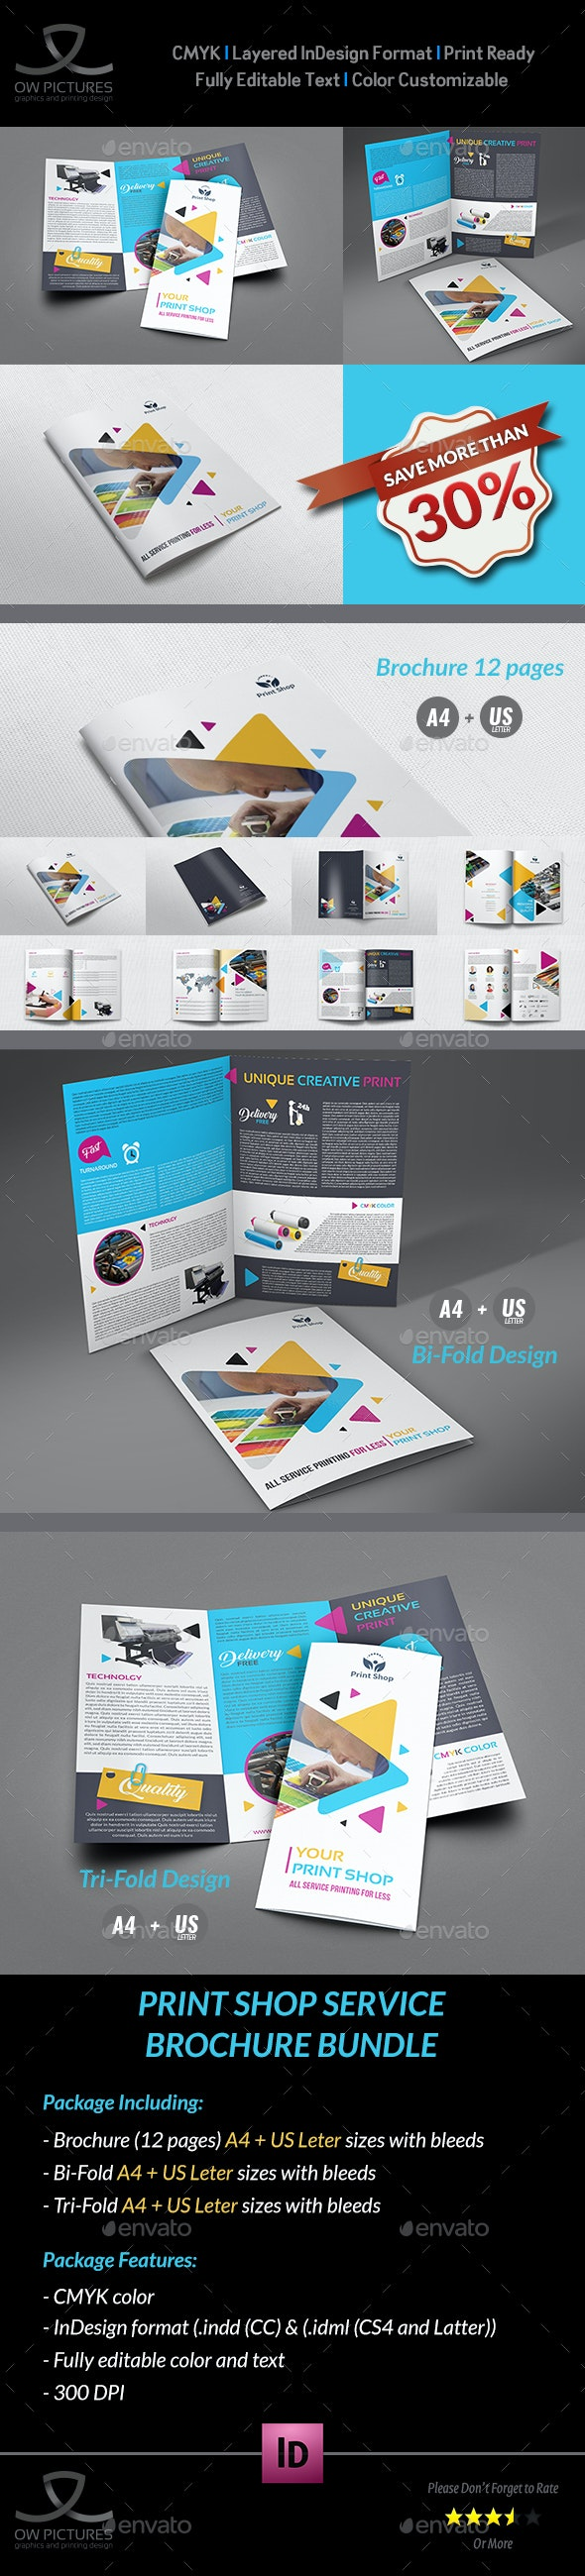 Print Shop Brochure Bundle Template - Brochures Print Templates